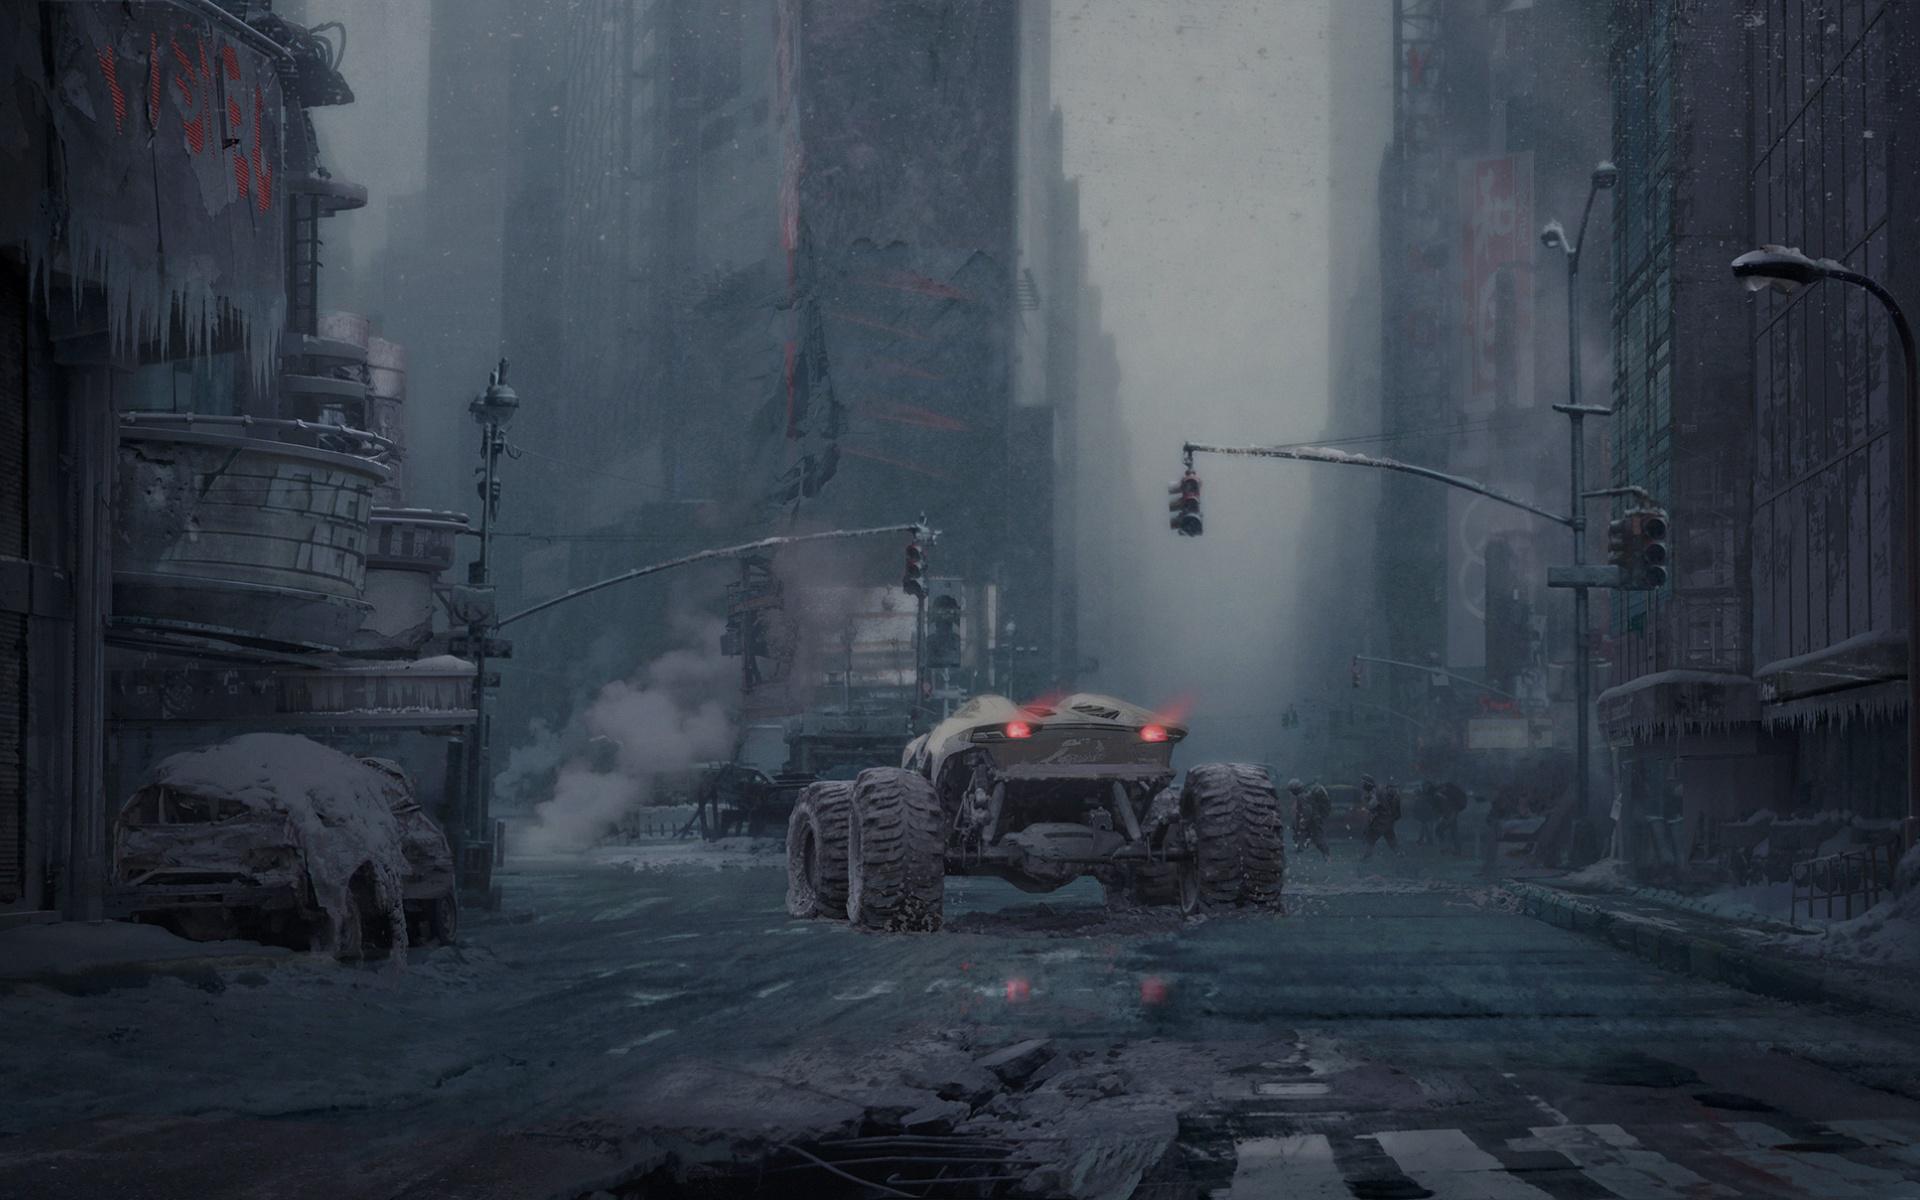 Destroyed City Desktop Background HD 2000x1208 deskbgcom 1920x1200